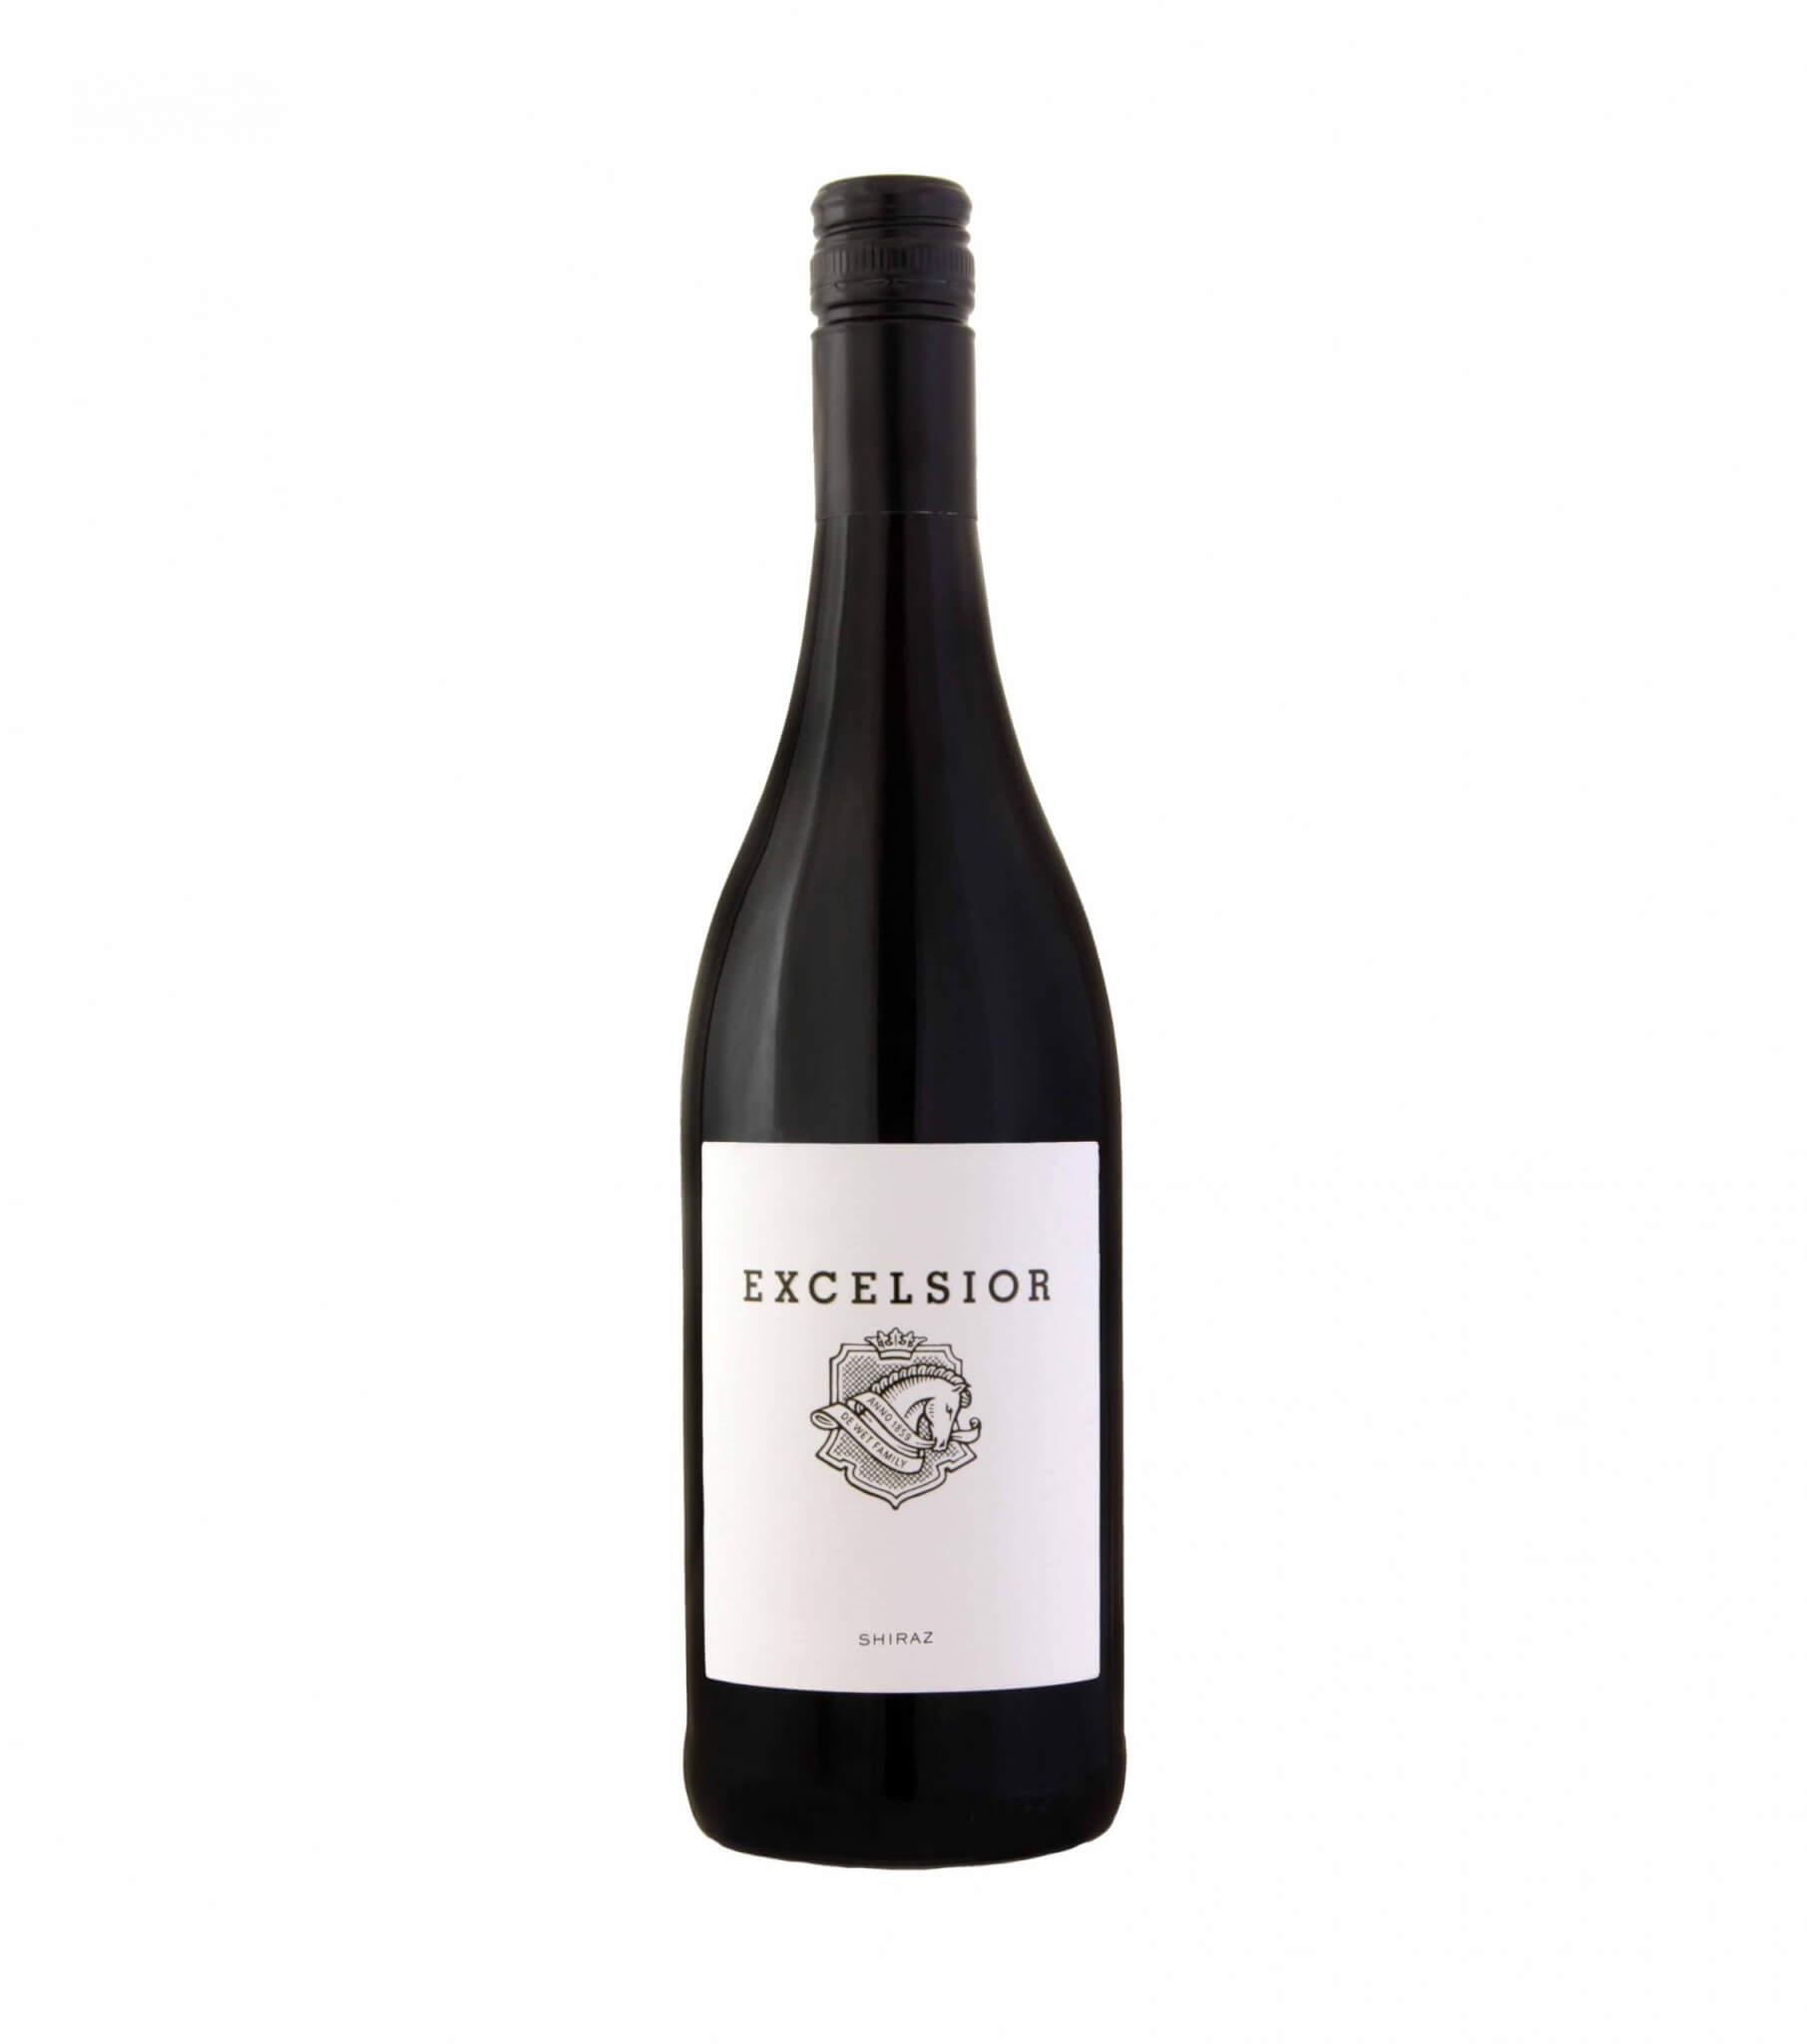 Excelsior Shiraz red wine 2015